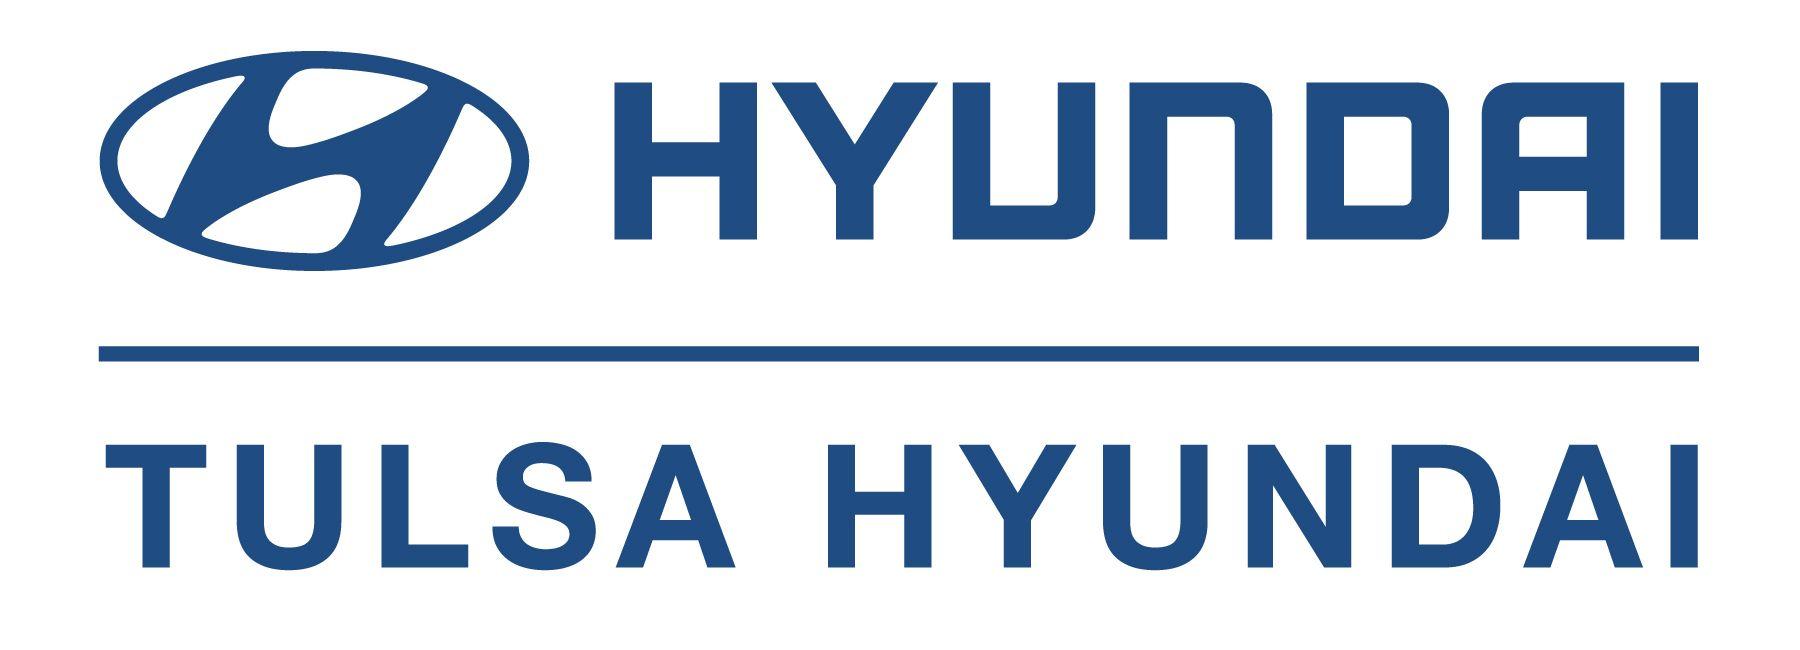 TulsaHyundai Logo